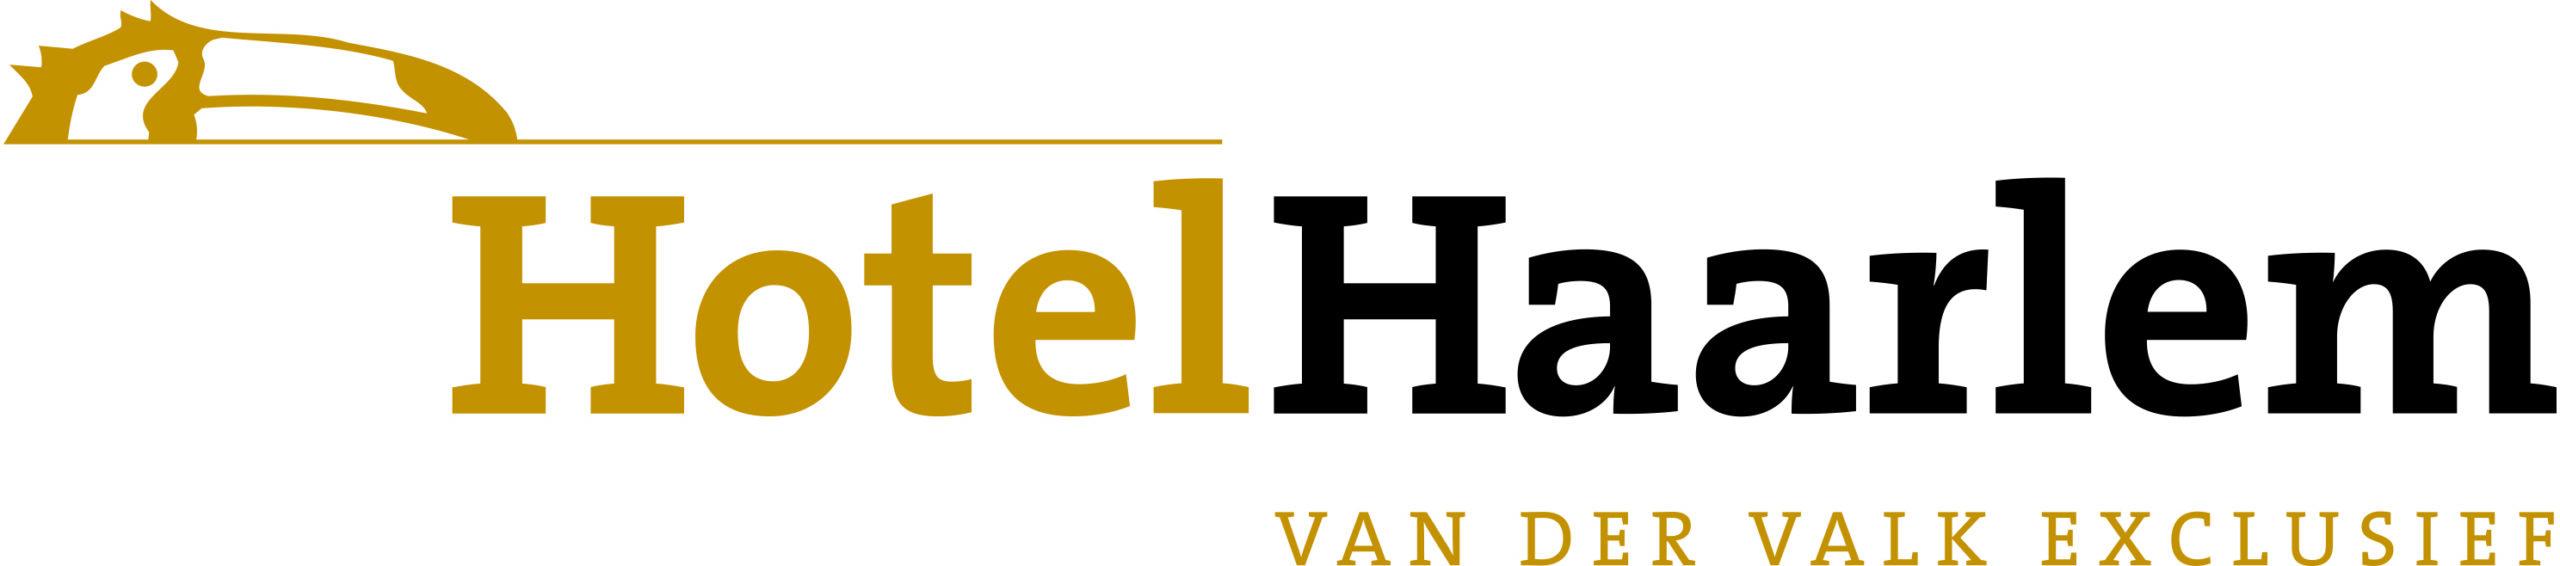 logo van der valk hotel haarlem 2020